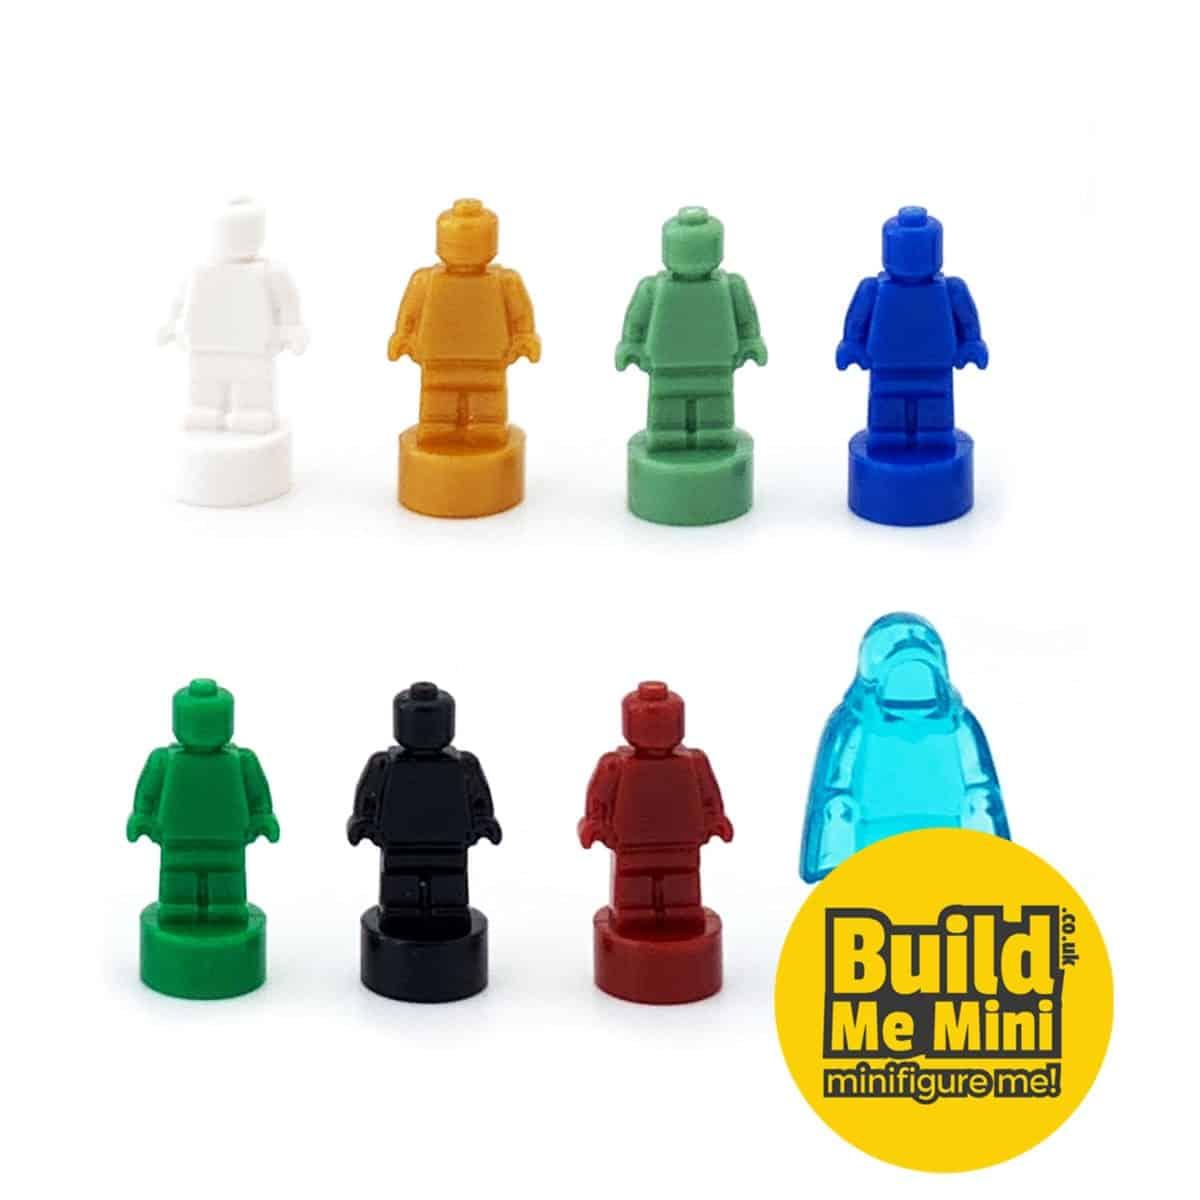 LEGO Minifigure Scale Microfigure